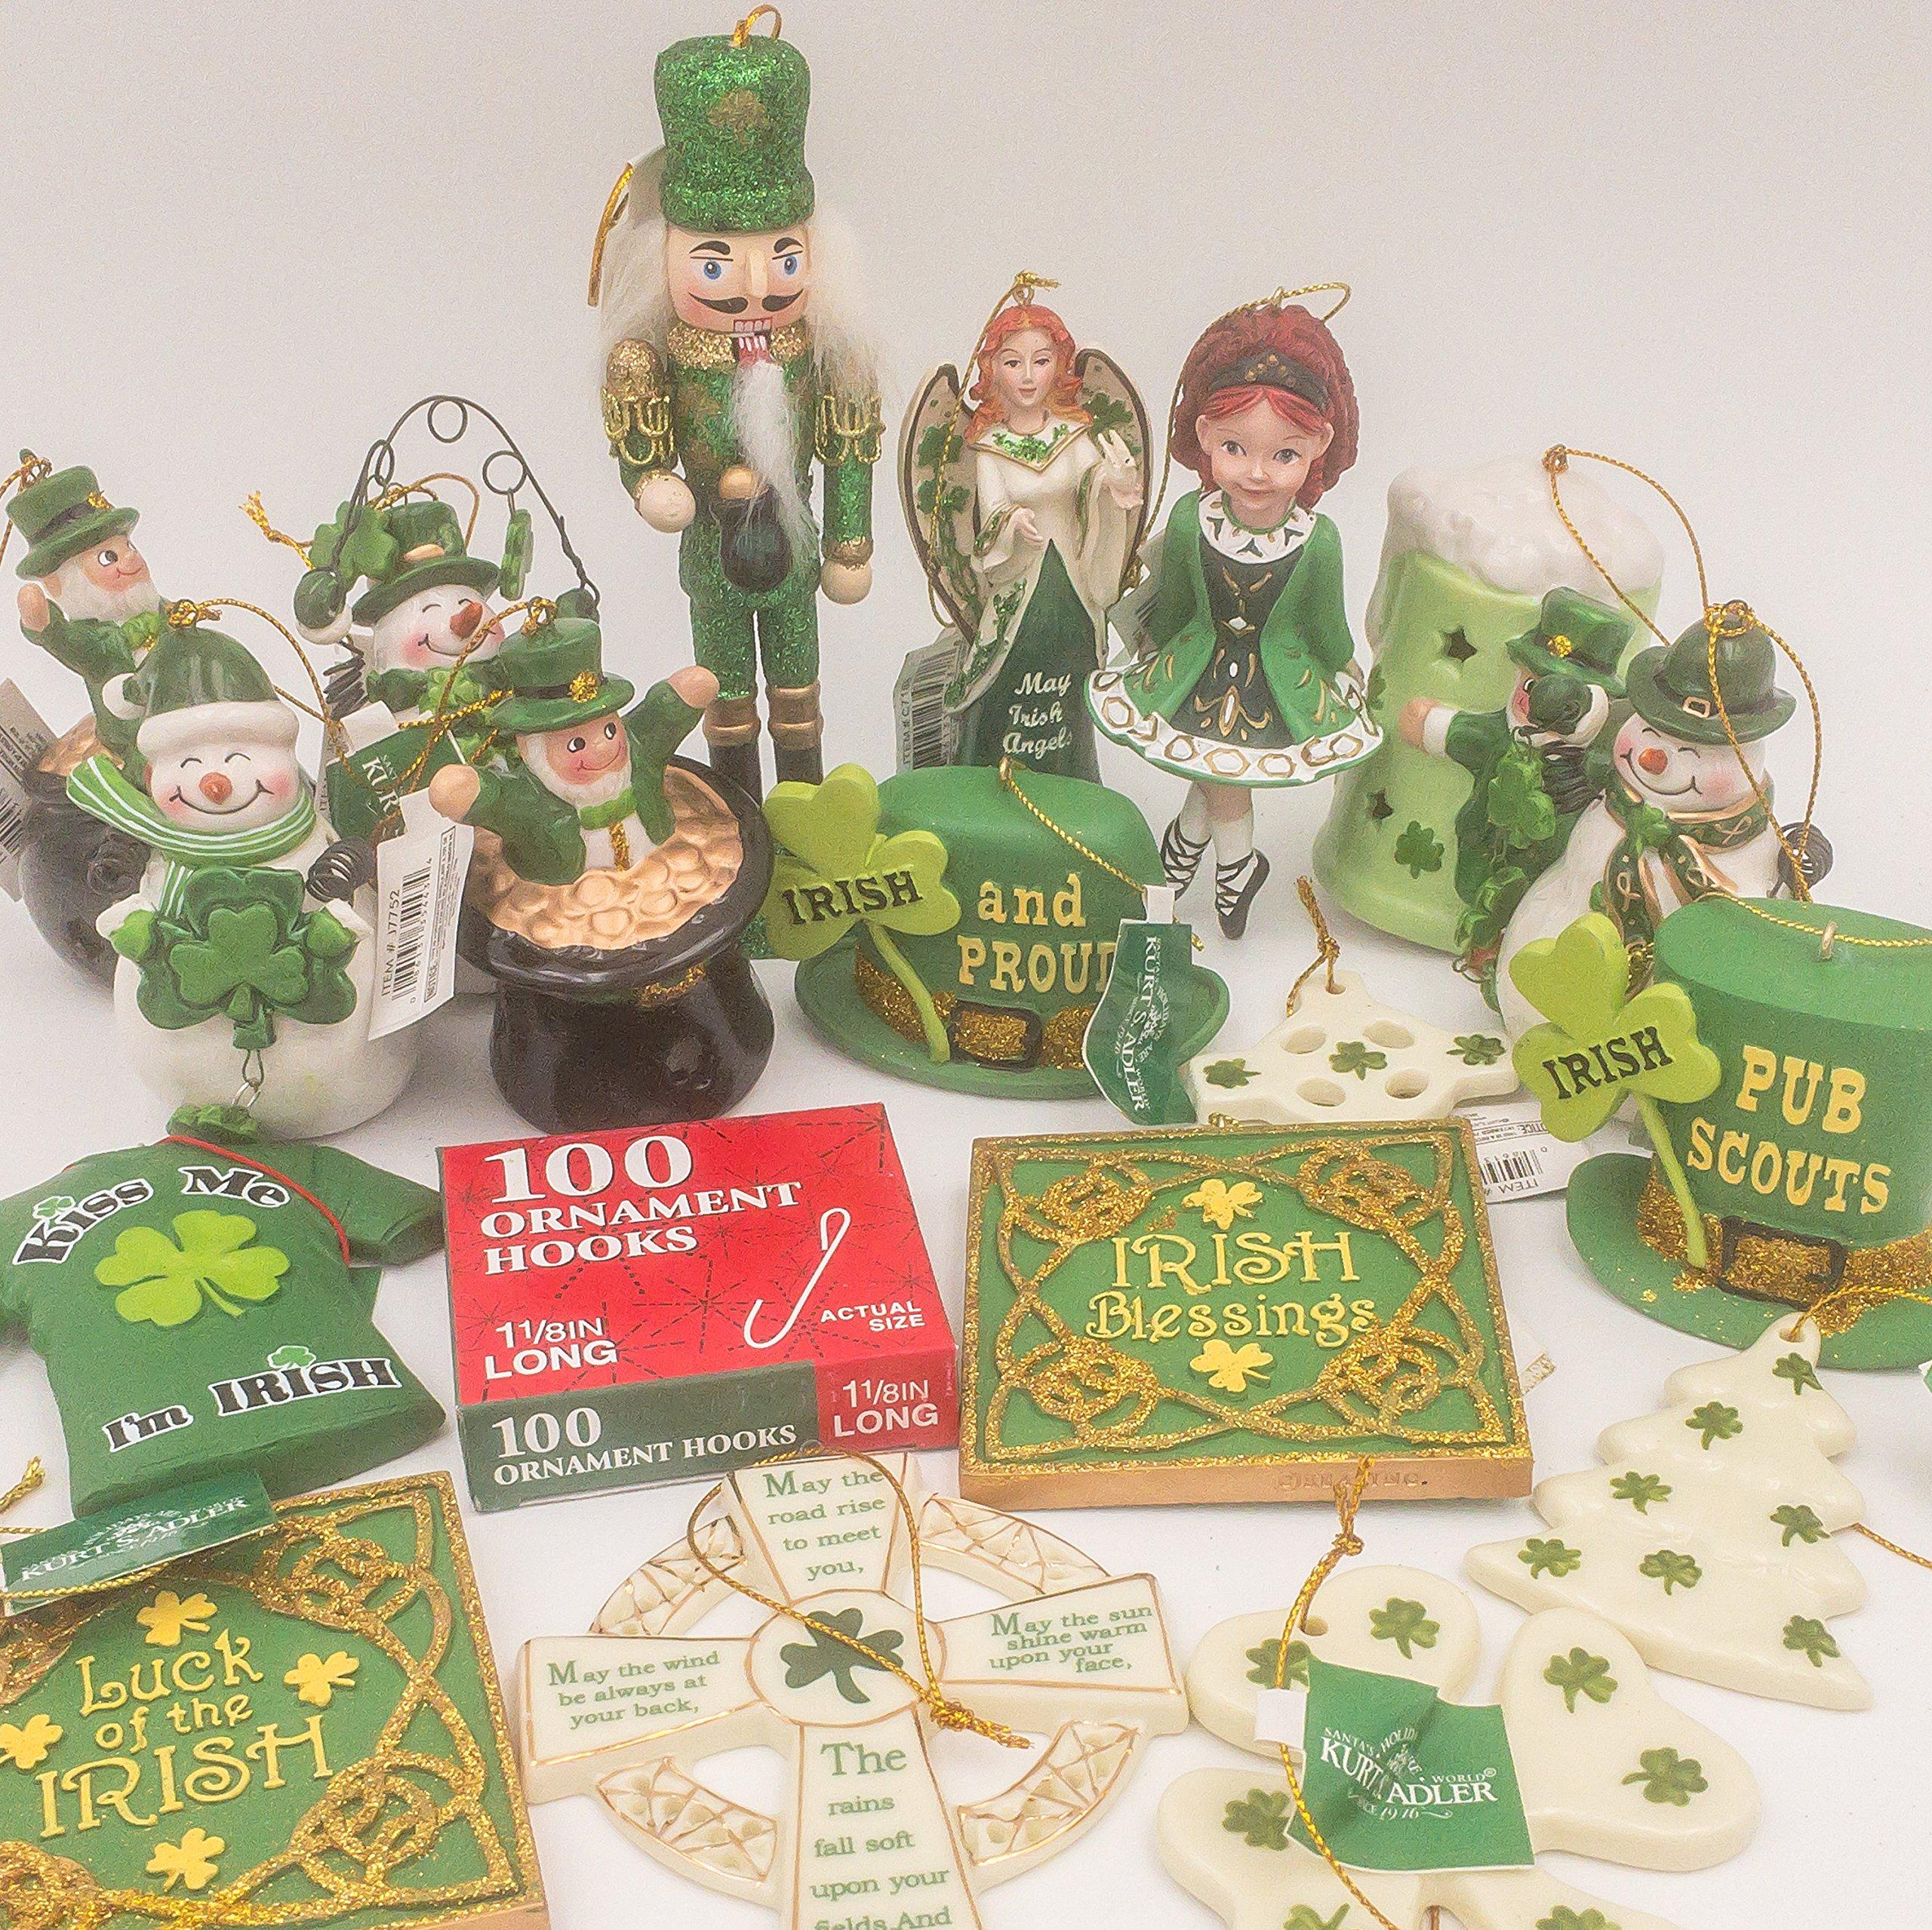 JZ Bundles Starter Set - Irish - Kurt Adler - 19-Piece Bundle - A Bundle of Christmas Ornaments Great Gift by JZ Bundles (Image #4)